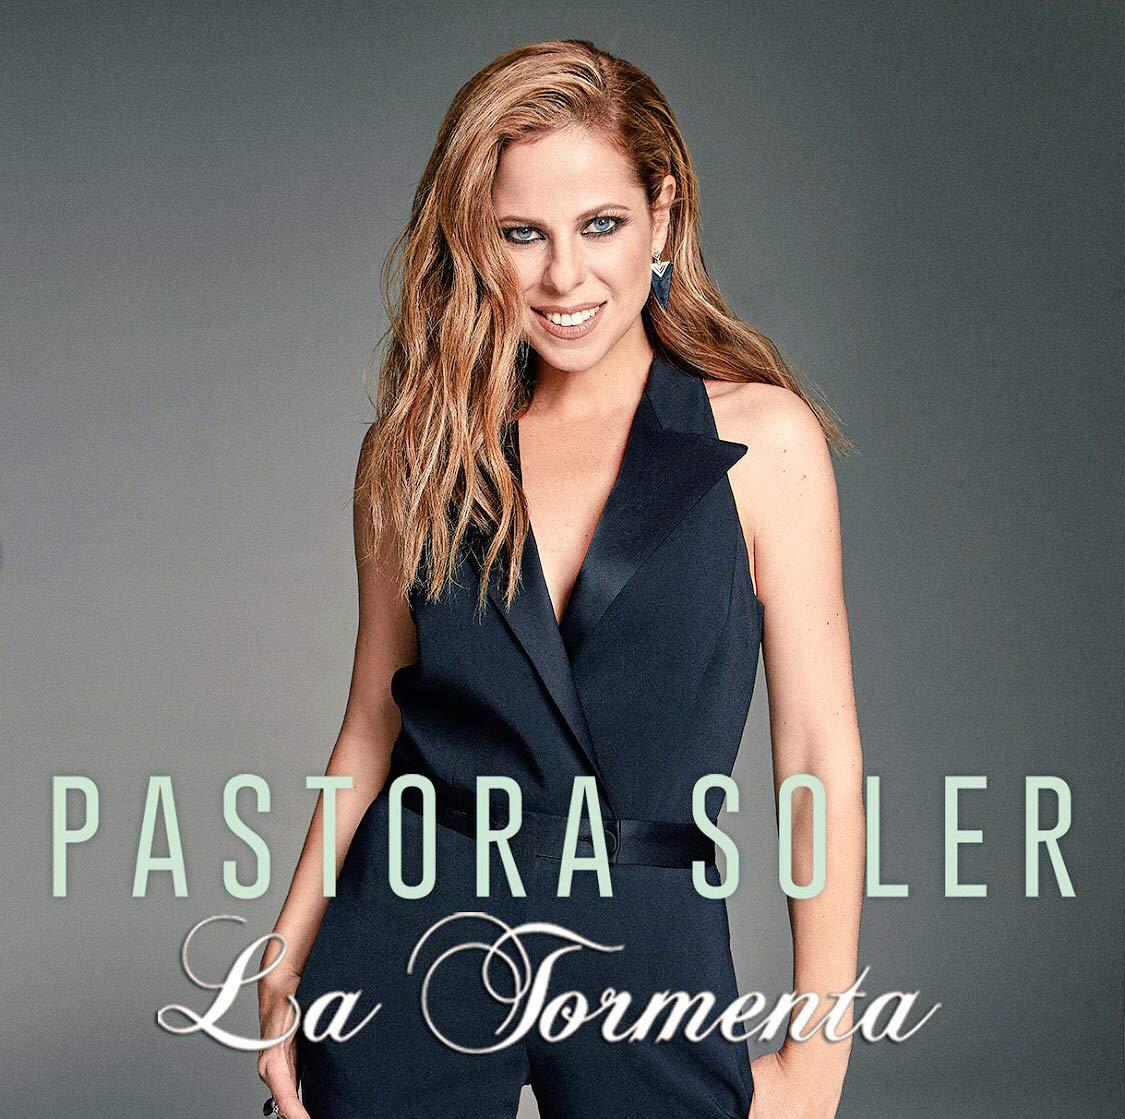 pastora-soler-la-tormenta_single.jpg